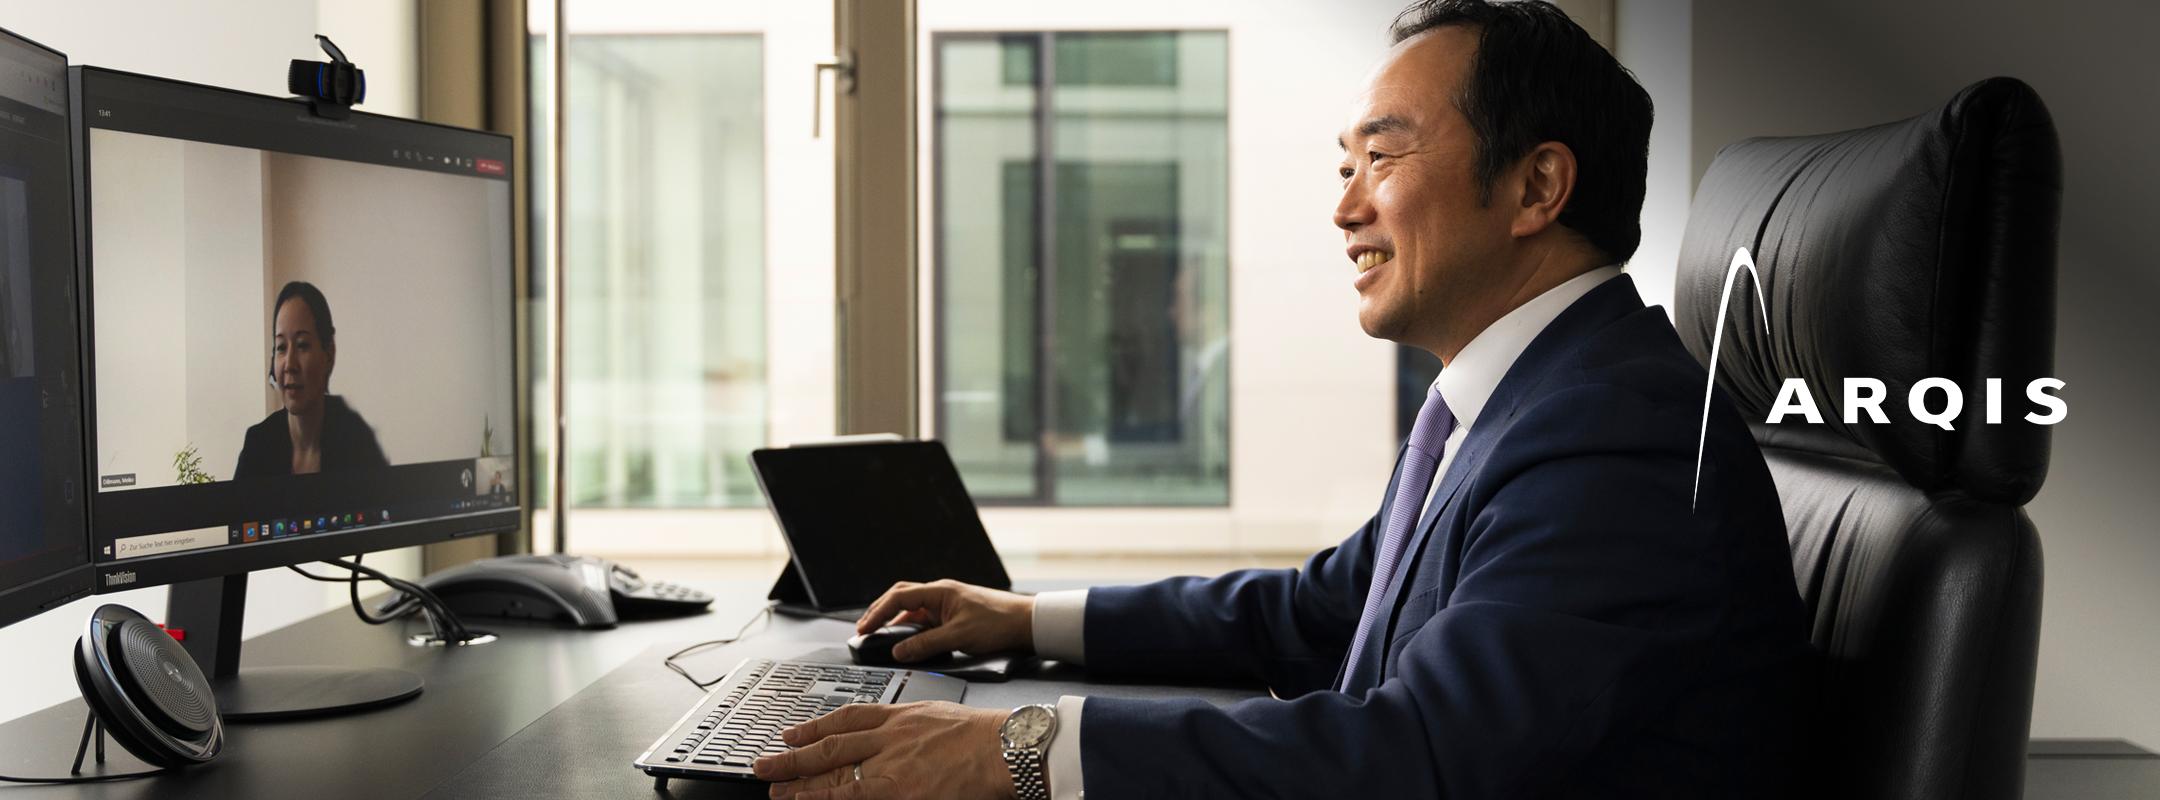 ARQIS-Gründungspartner Dr. Shigeo Yamaguchi